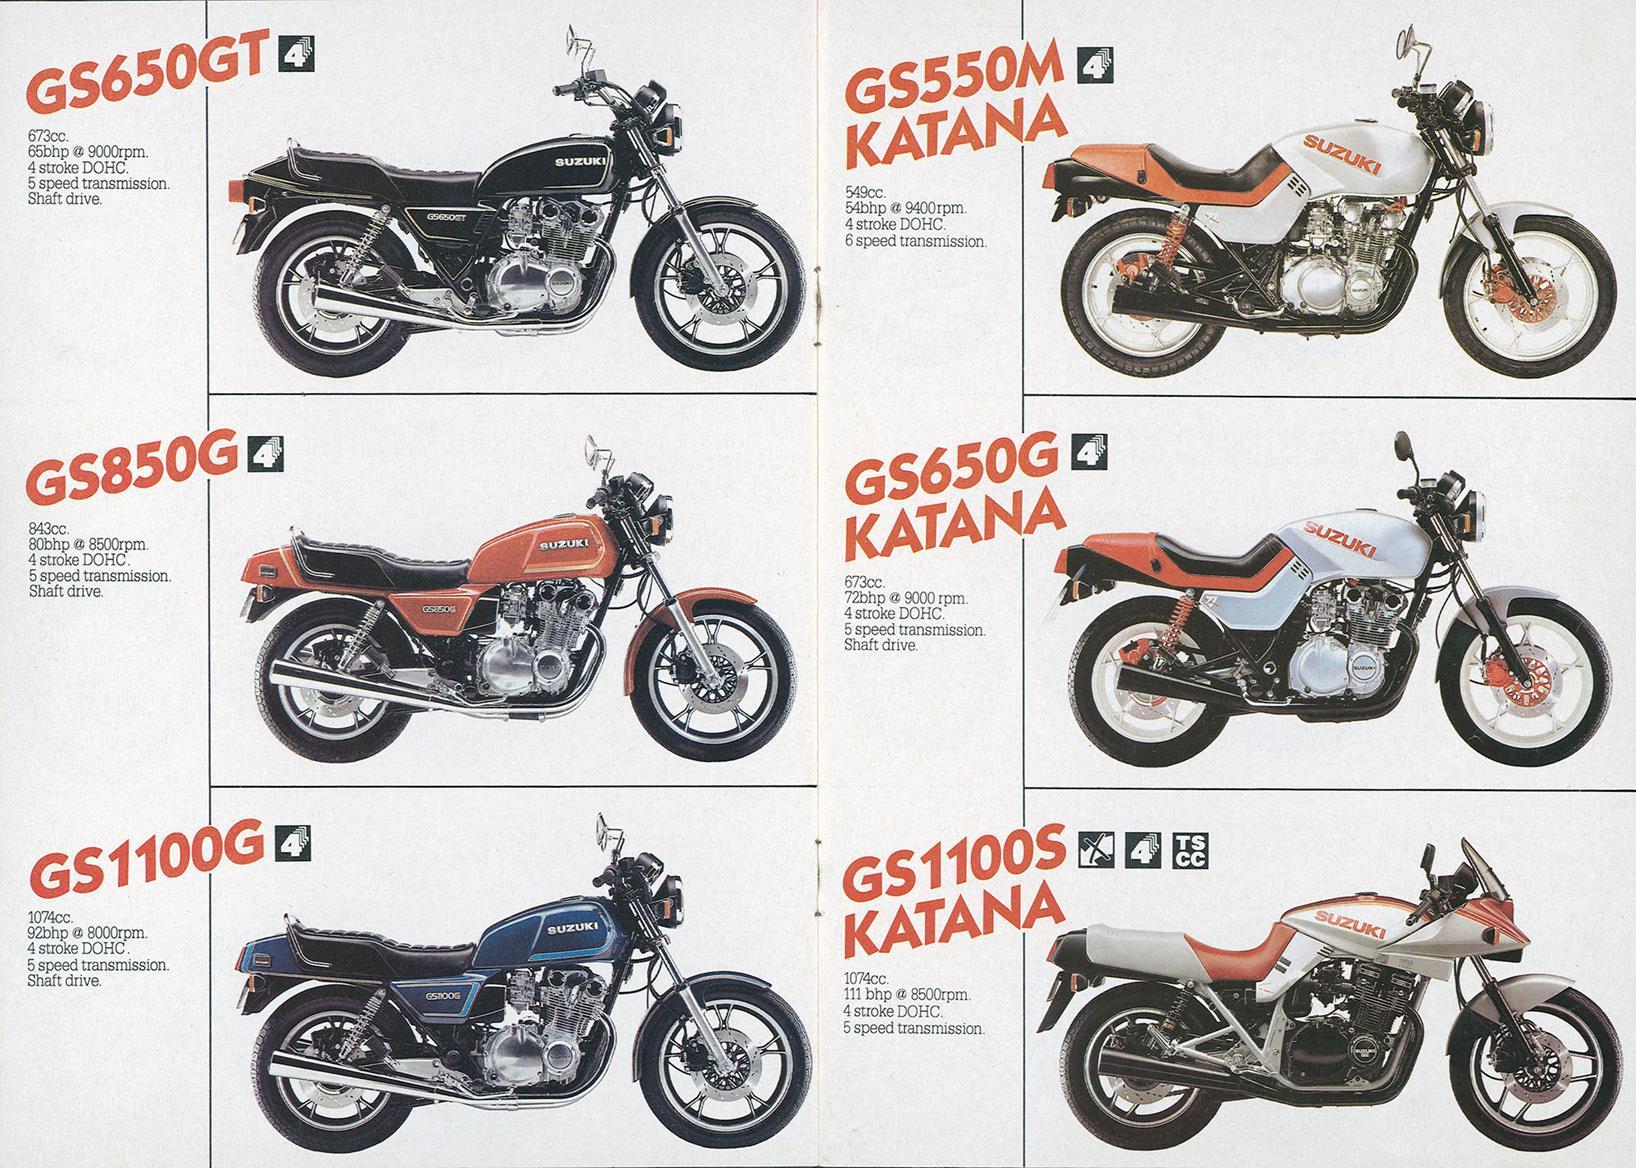 Original Suzuki Katana brochure